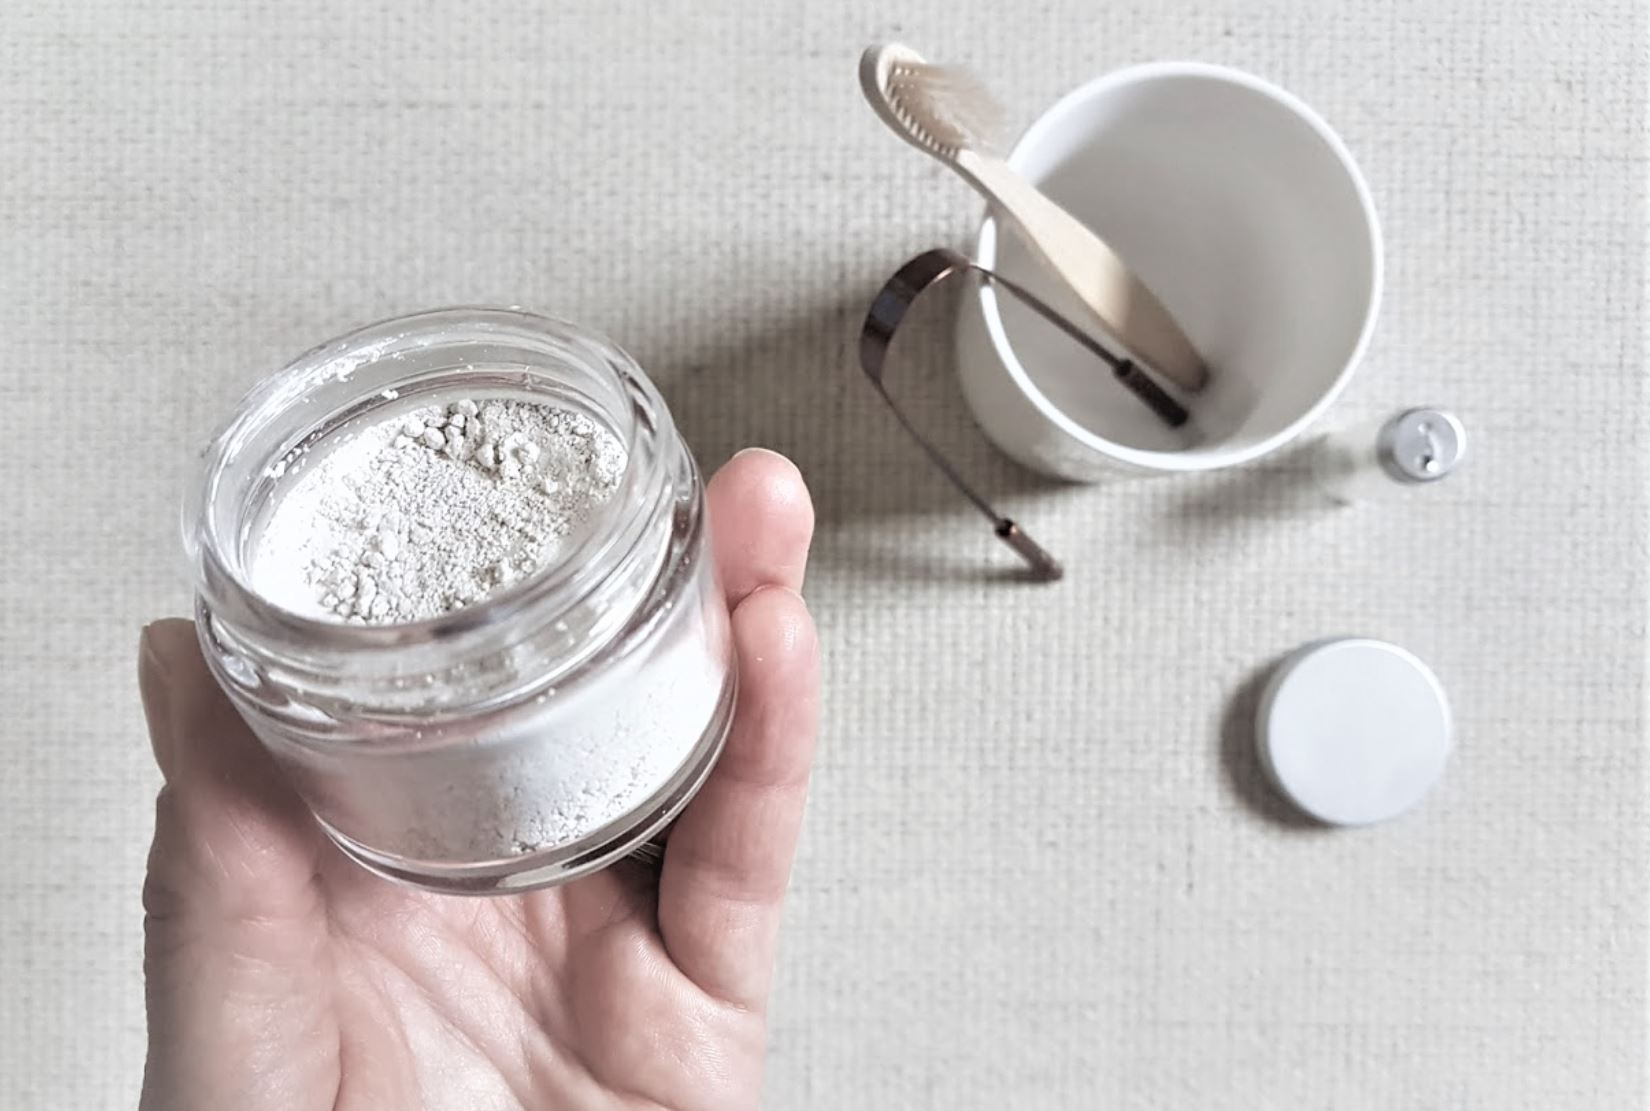 recette de dentifrice naturel en poudre brosse fil